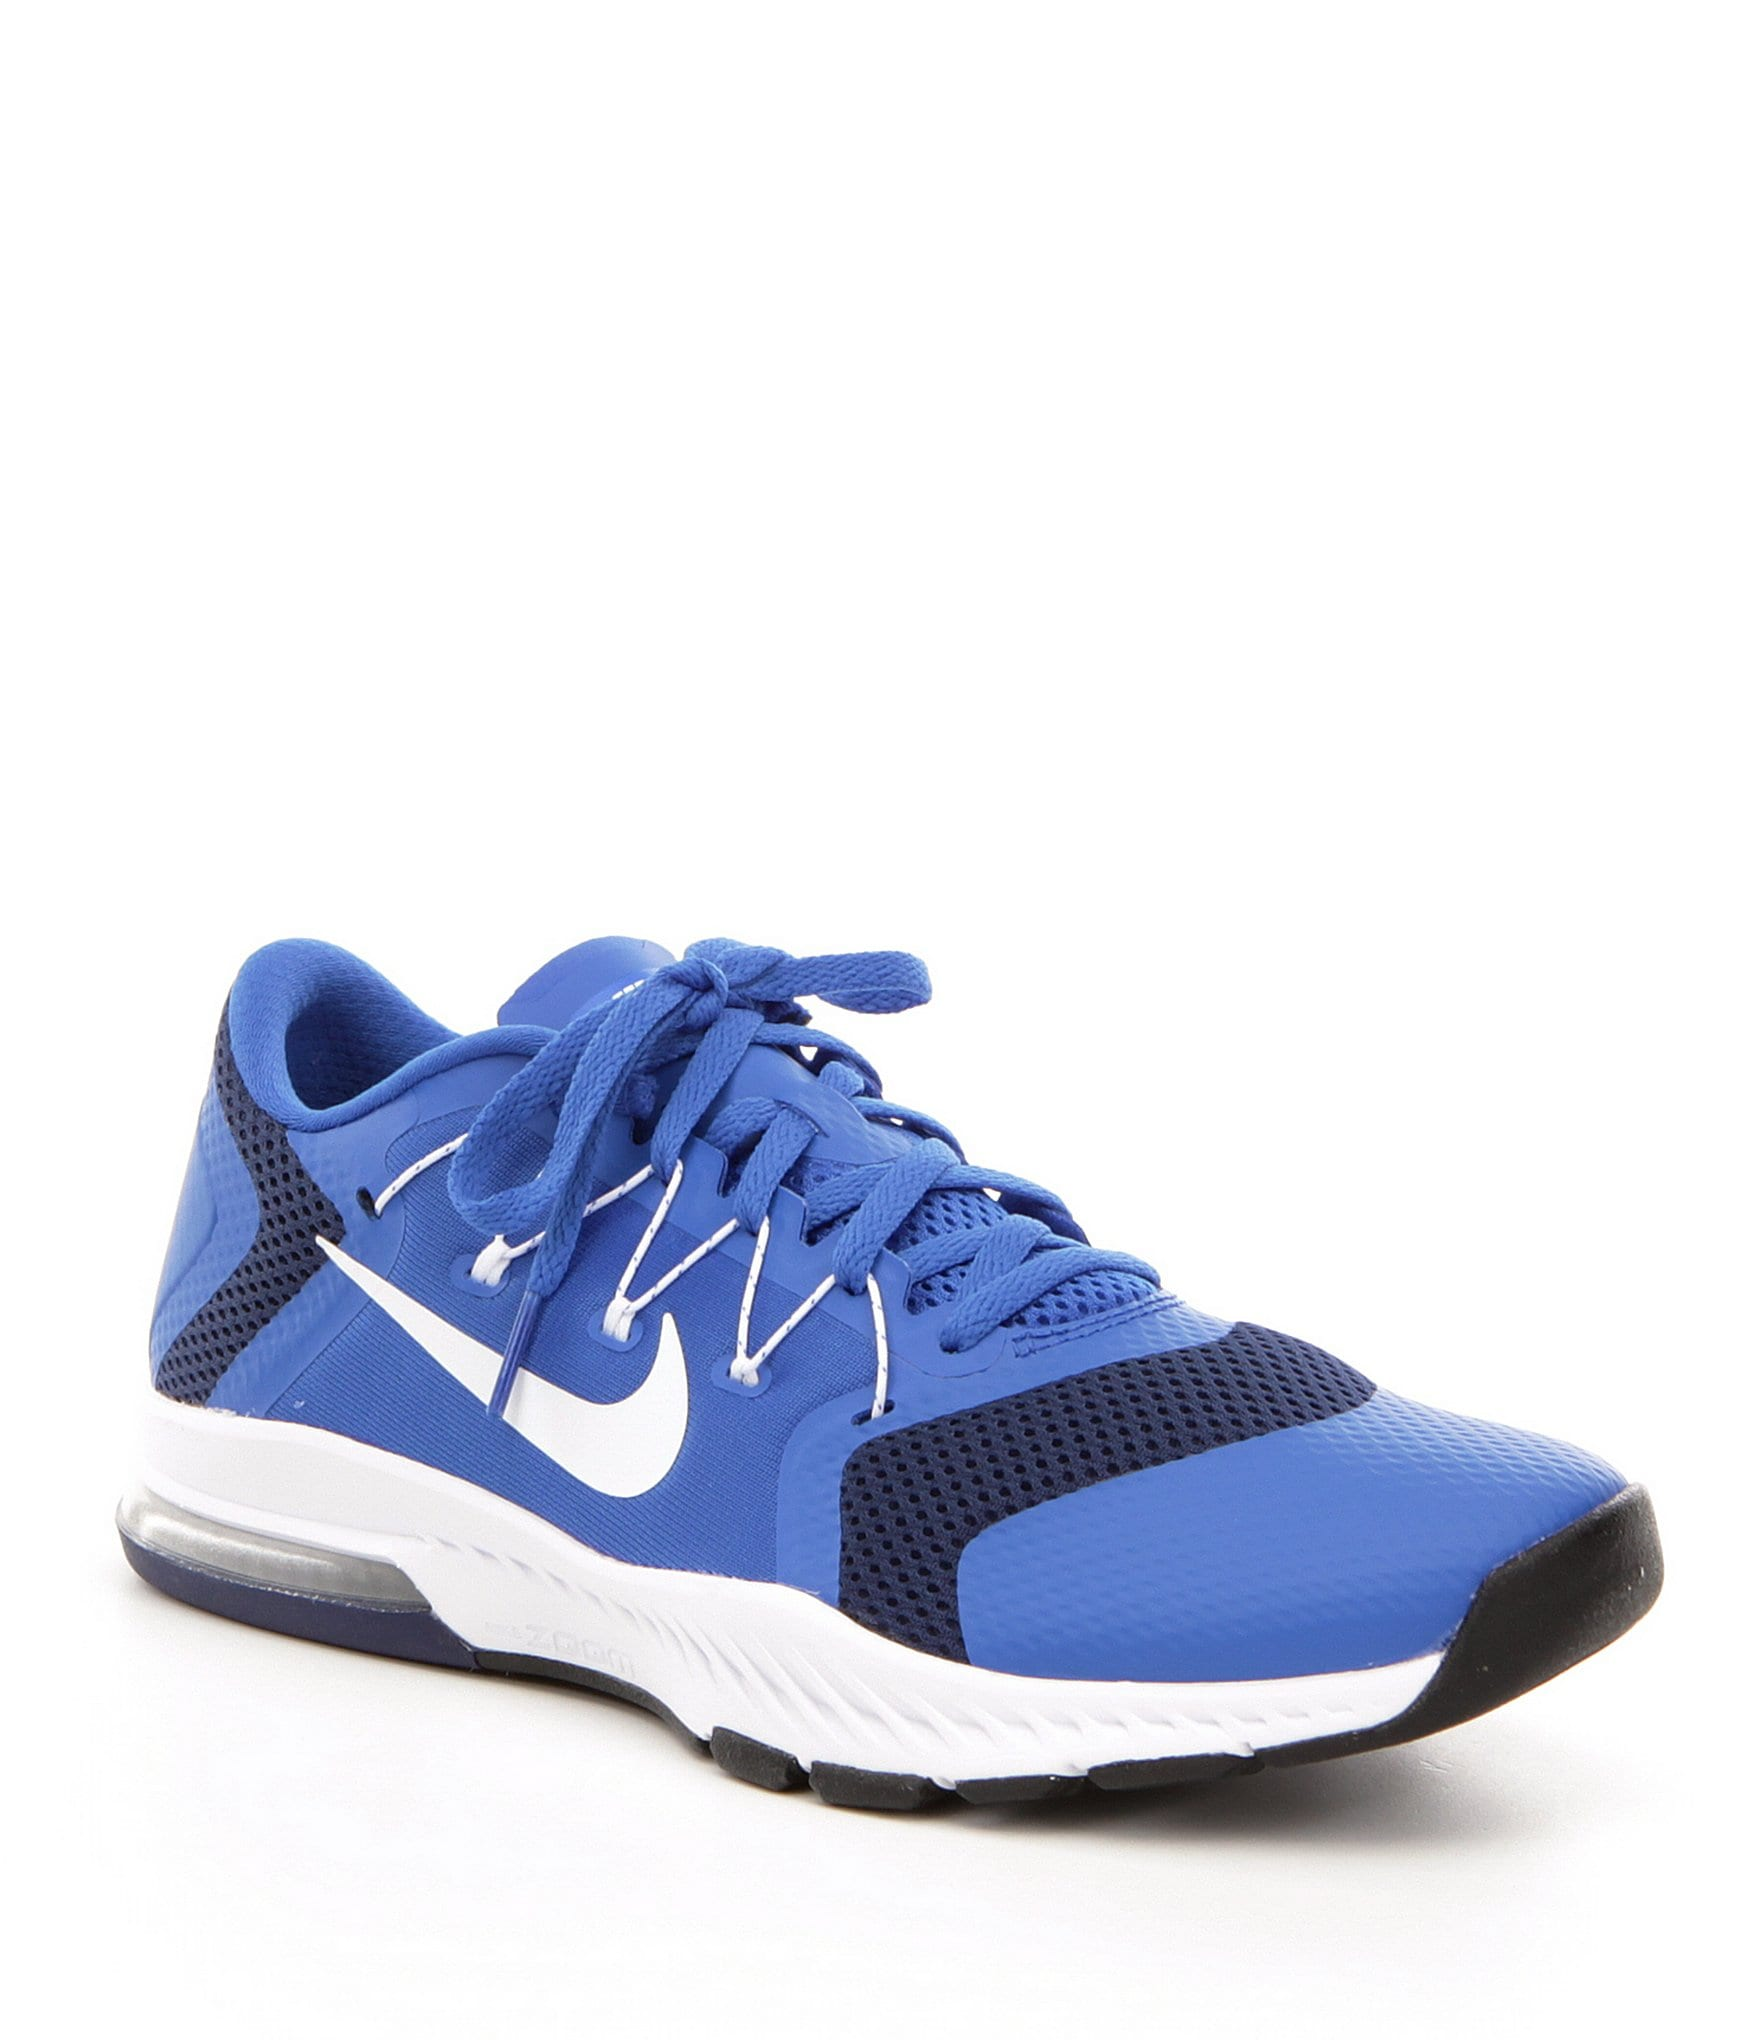 cheap for discount 526ee 2b8ab ... uk free 5.0 girls running shoes dillards nike mens zoom train b06c6  b705e